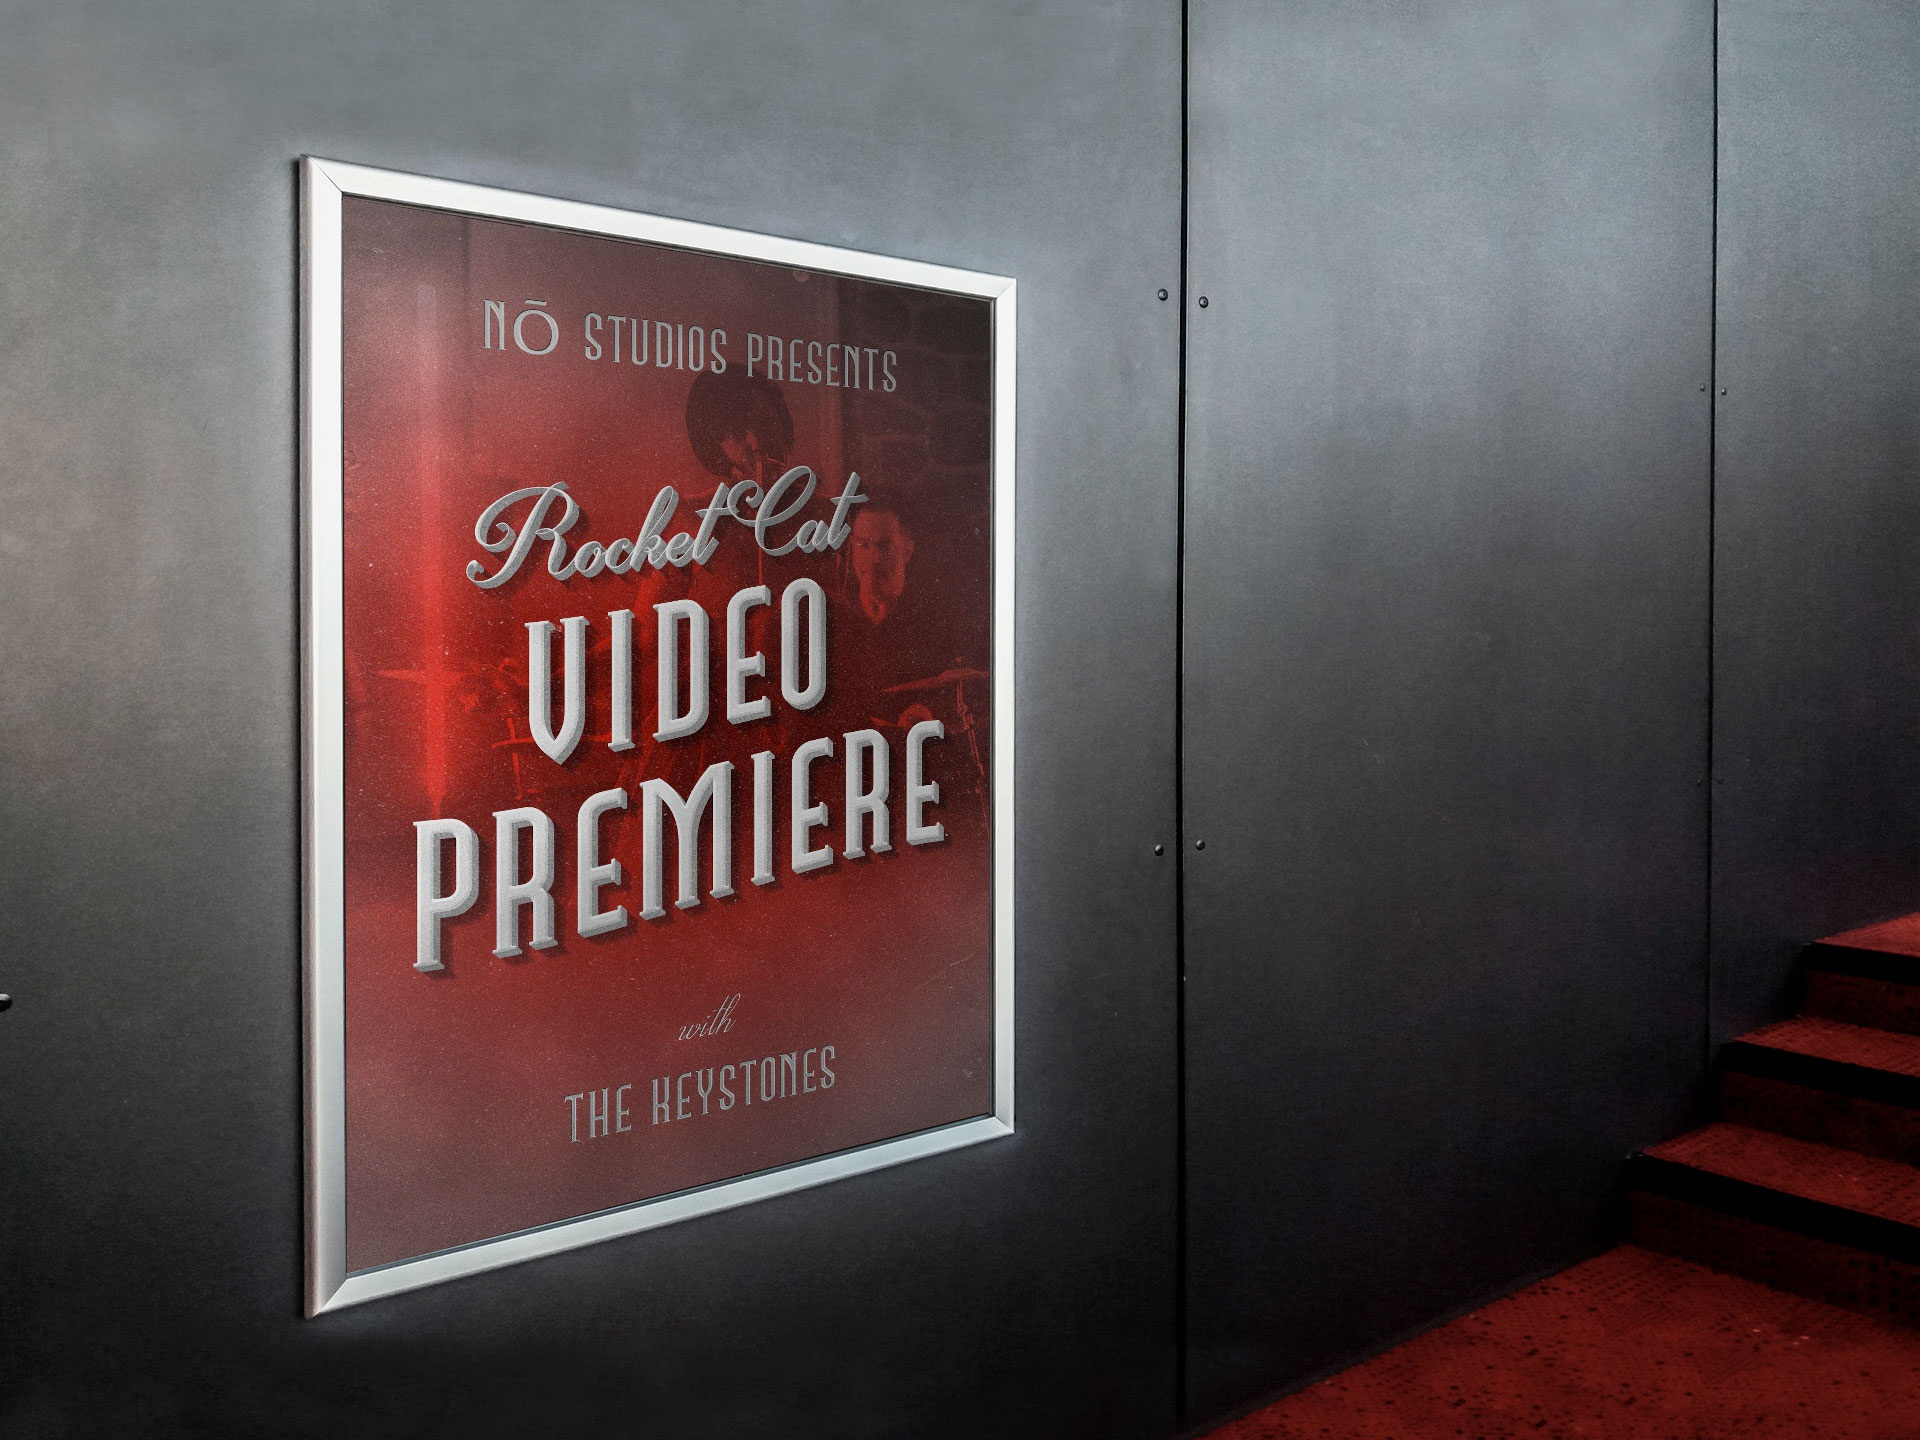 Video premier promo